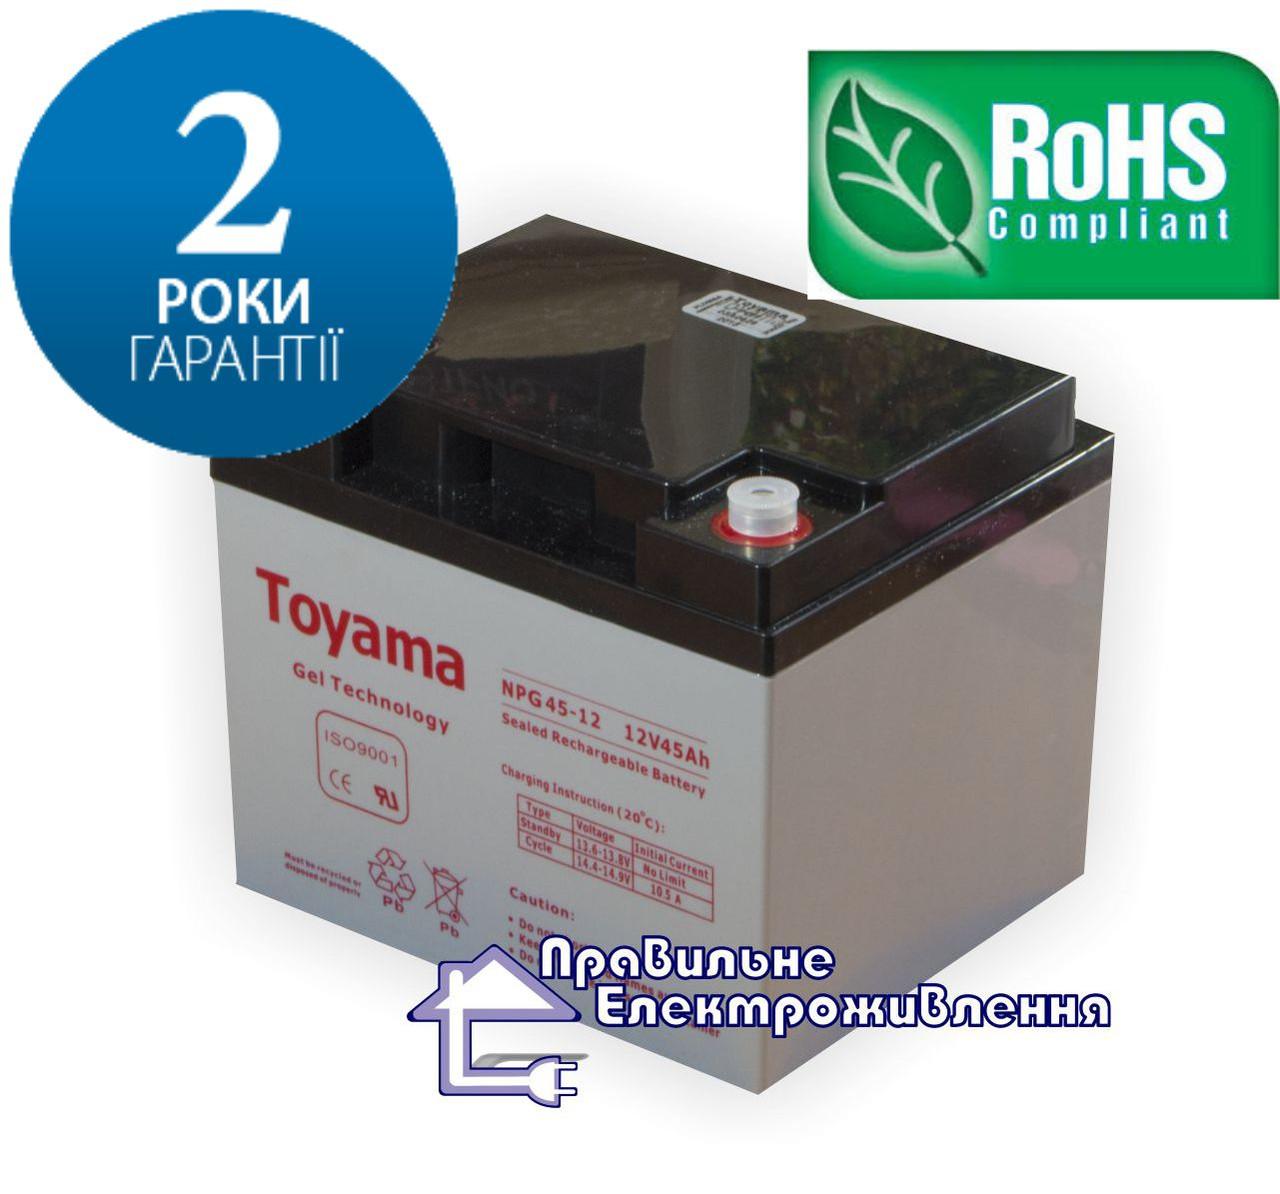 Гелева акумуляторна батарея Toyama NPG45-12